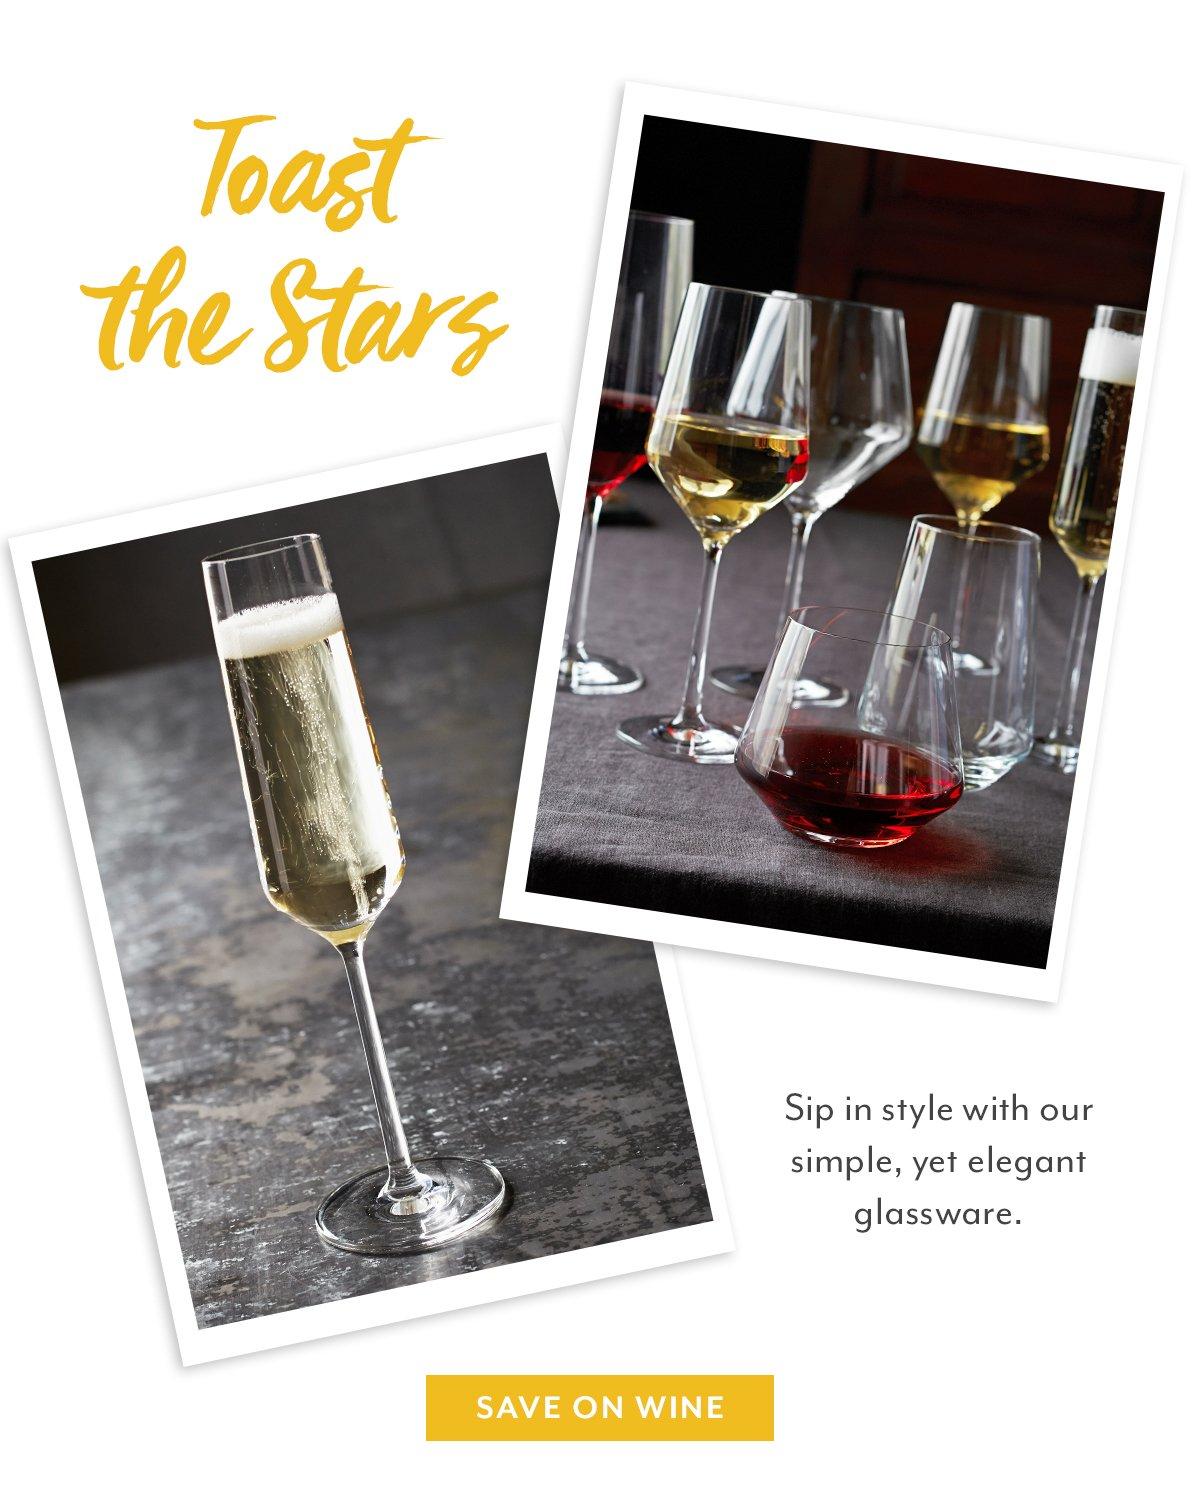 Toast the Stars